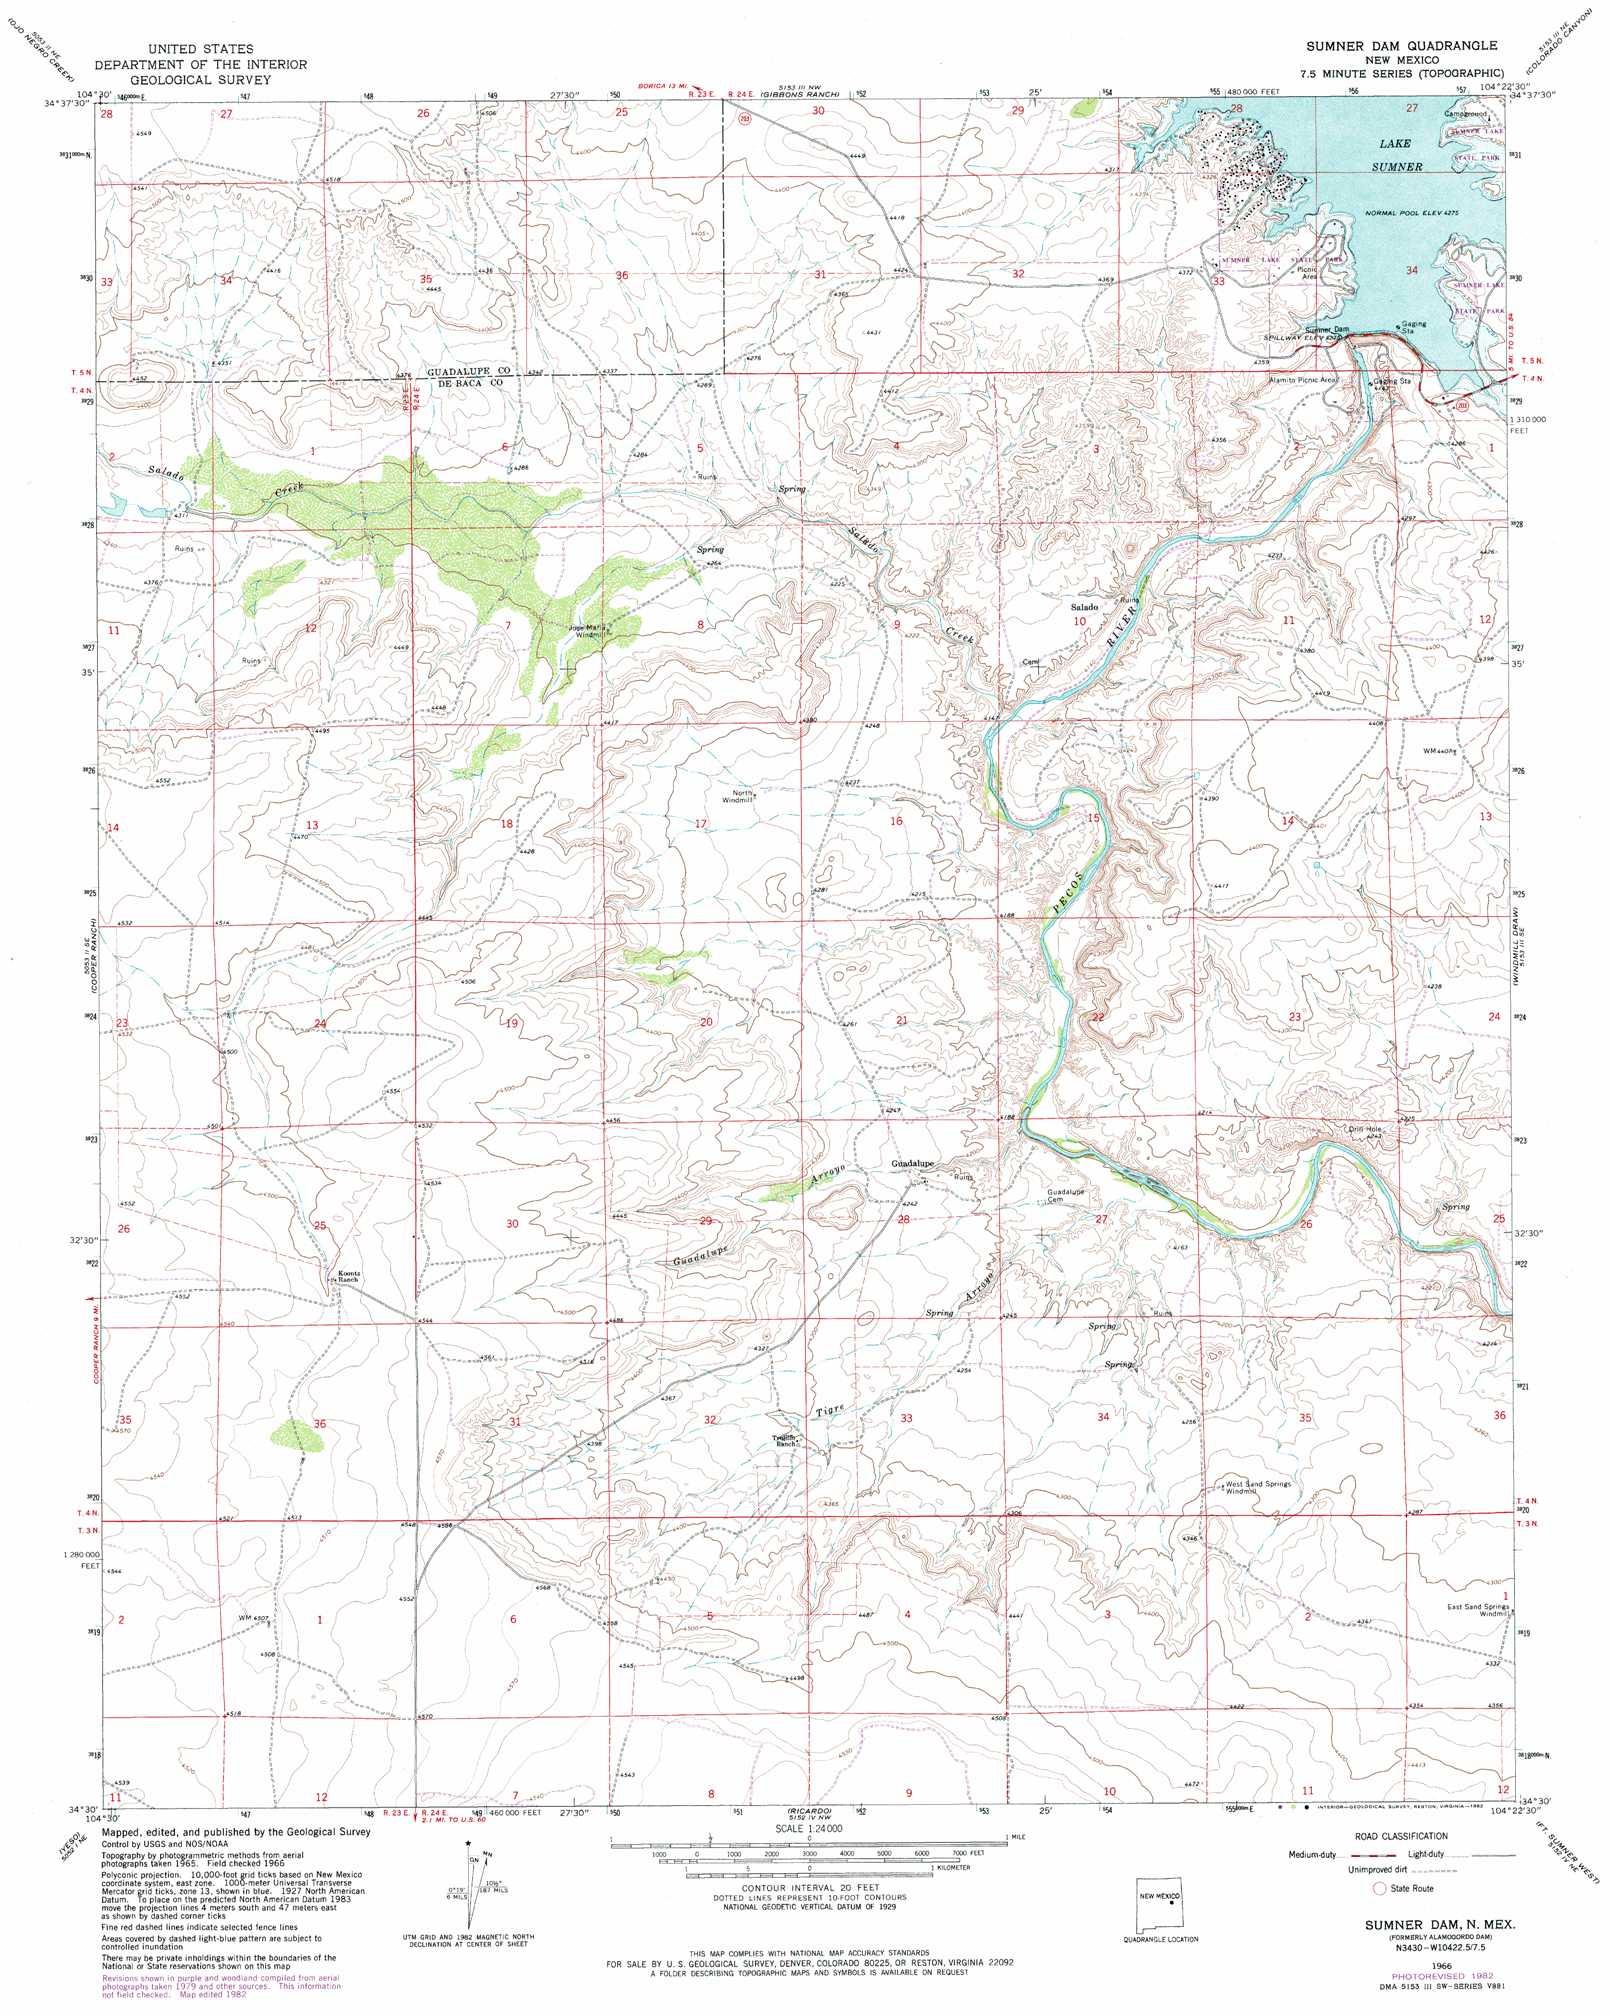 Alamogordo Dam topographic map NM USGS Topo Quad 34104e4